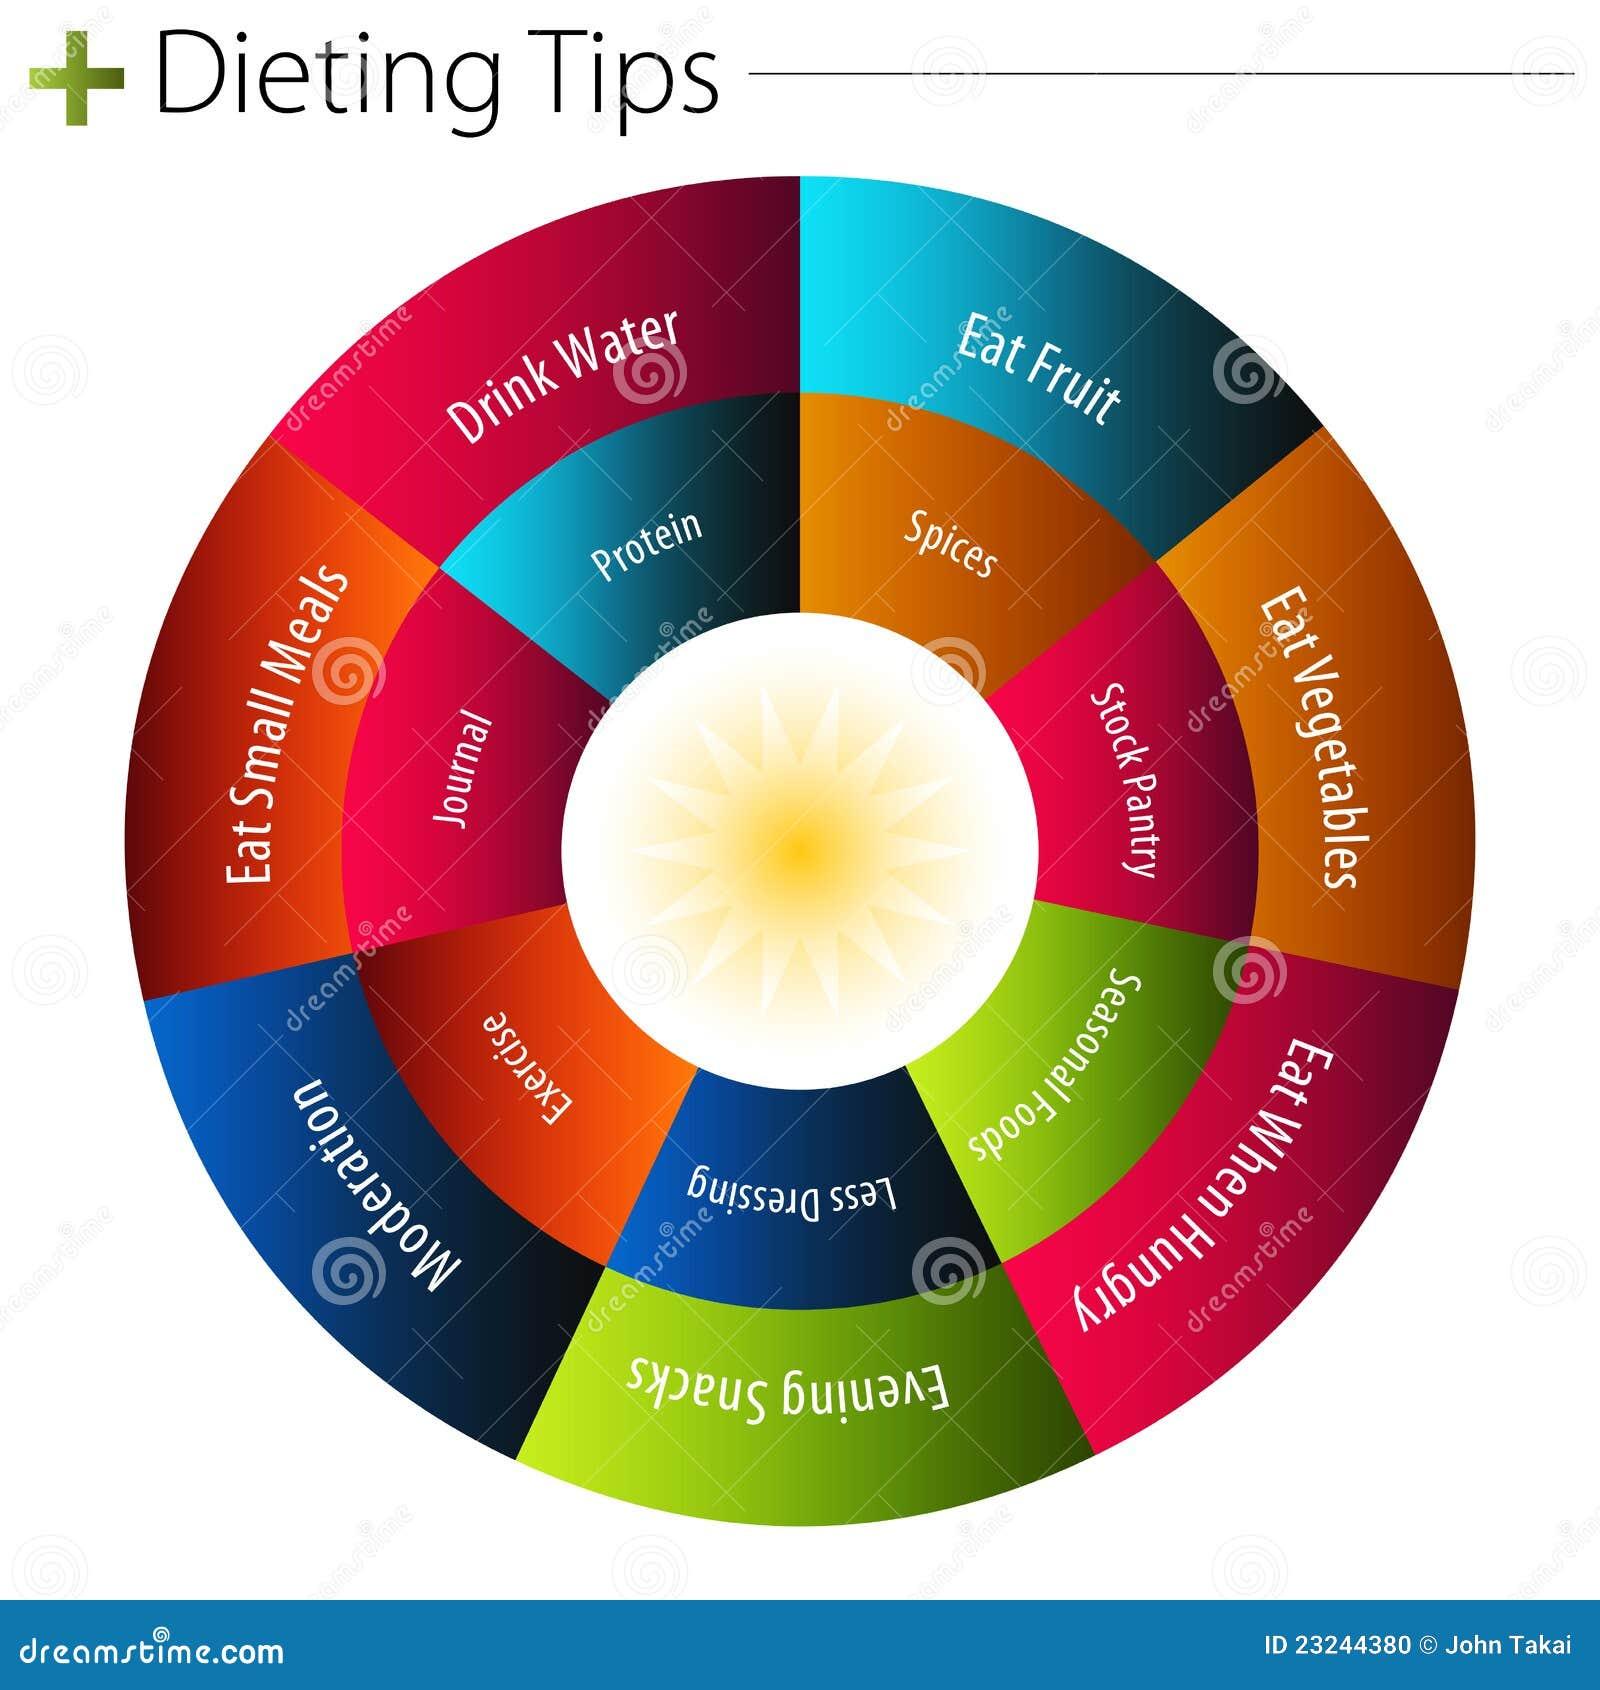 dieting-tips-chart-23244380.jpg